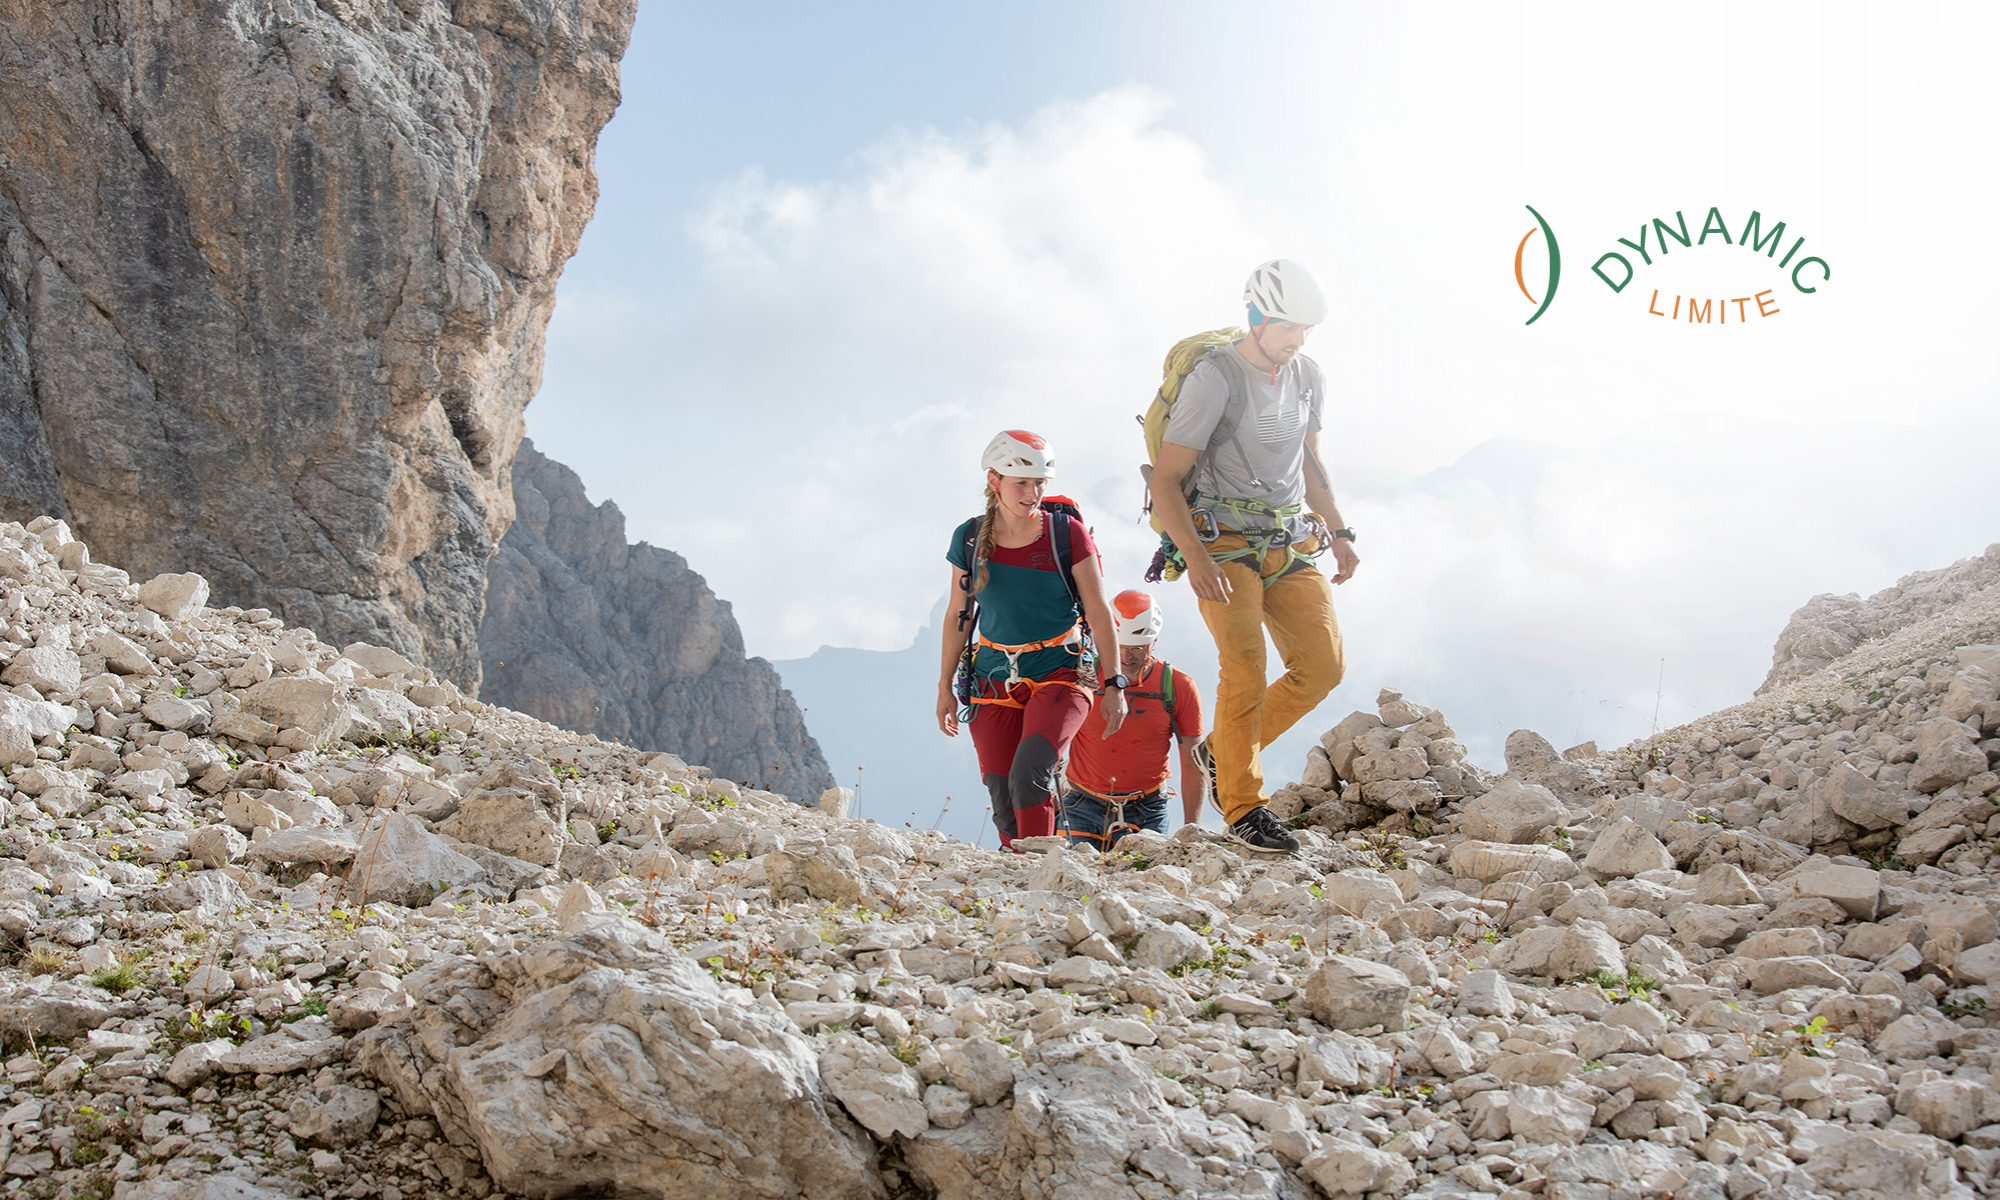 Dynamic Límite - Ropa Deporte Montaña & Outdoor